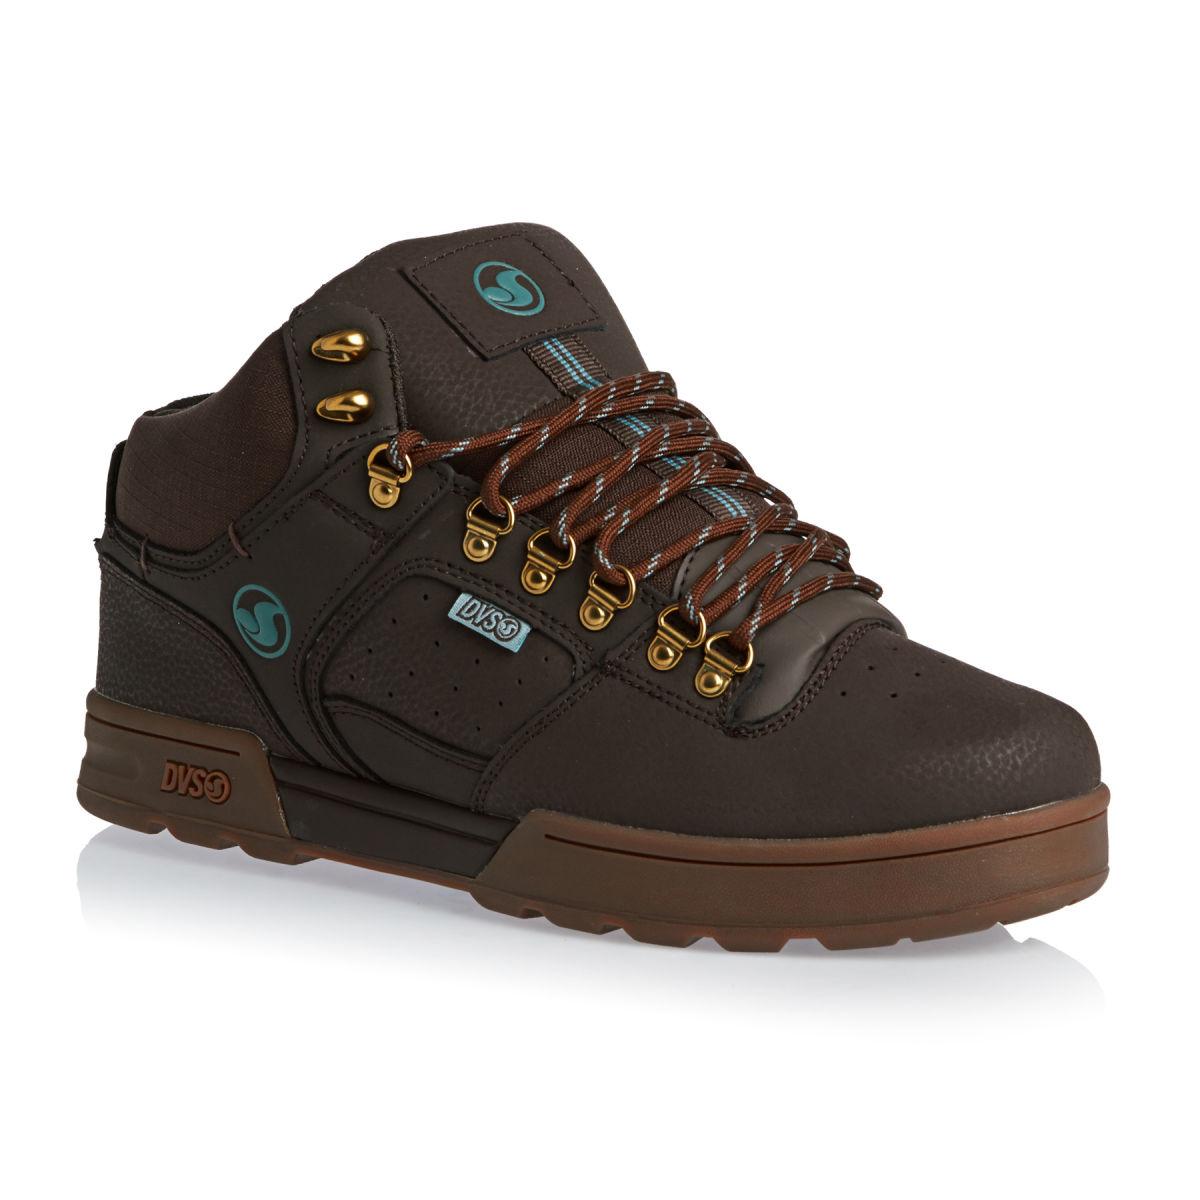 pánské zimní boty dvs WESTRIDGE Brown Gum Nubuck Snow 85014b0c7f